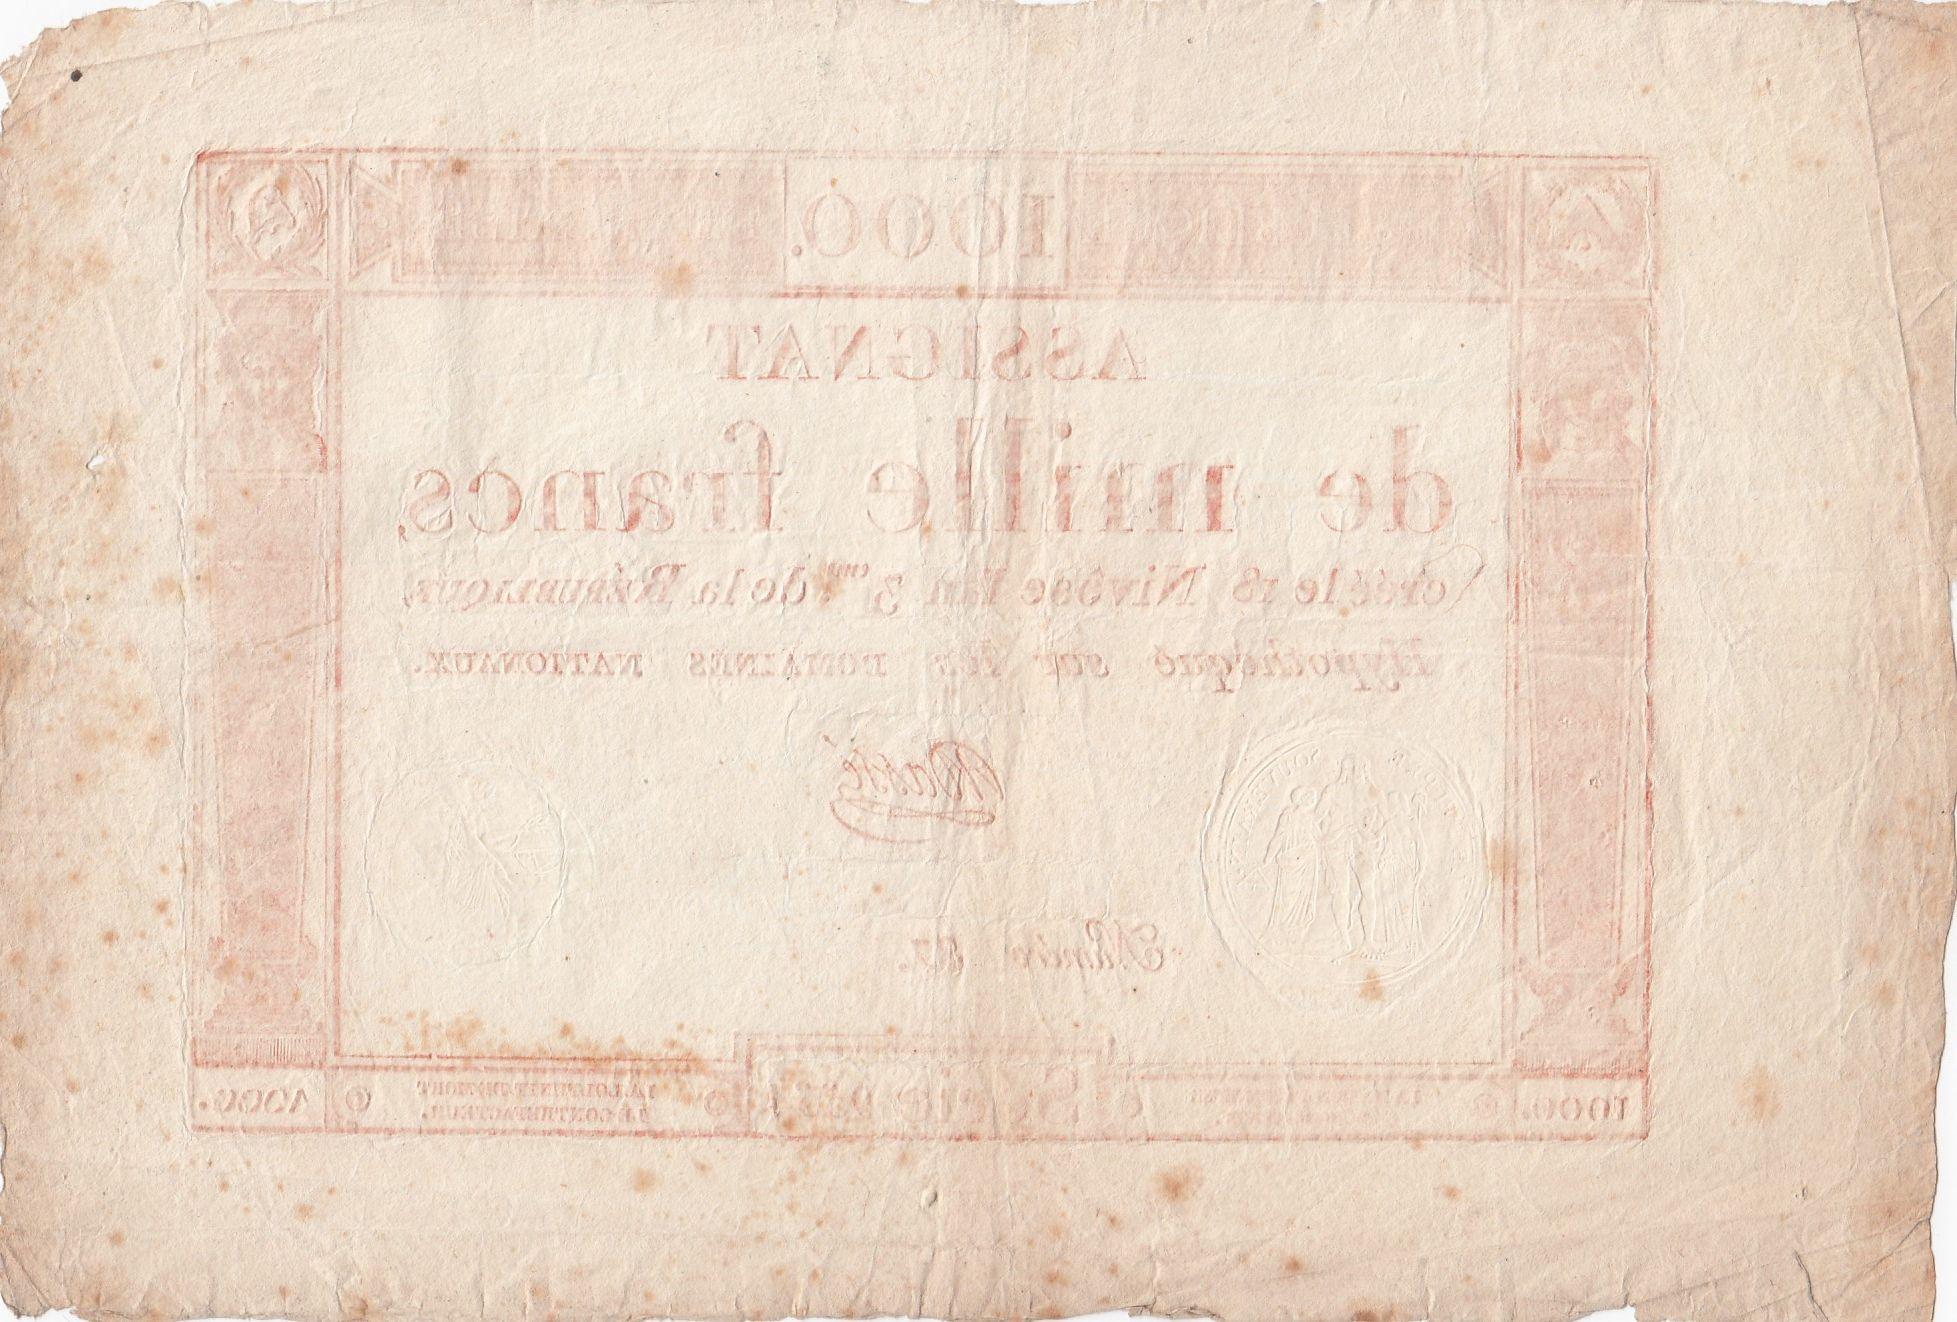 France 1000 Francs 18 Nivose An III - 7.1.1795 - Sign. Massé - VF